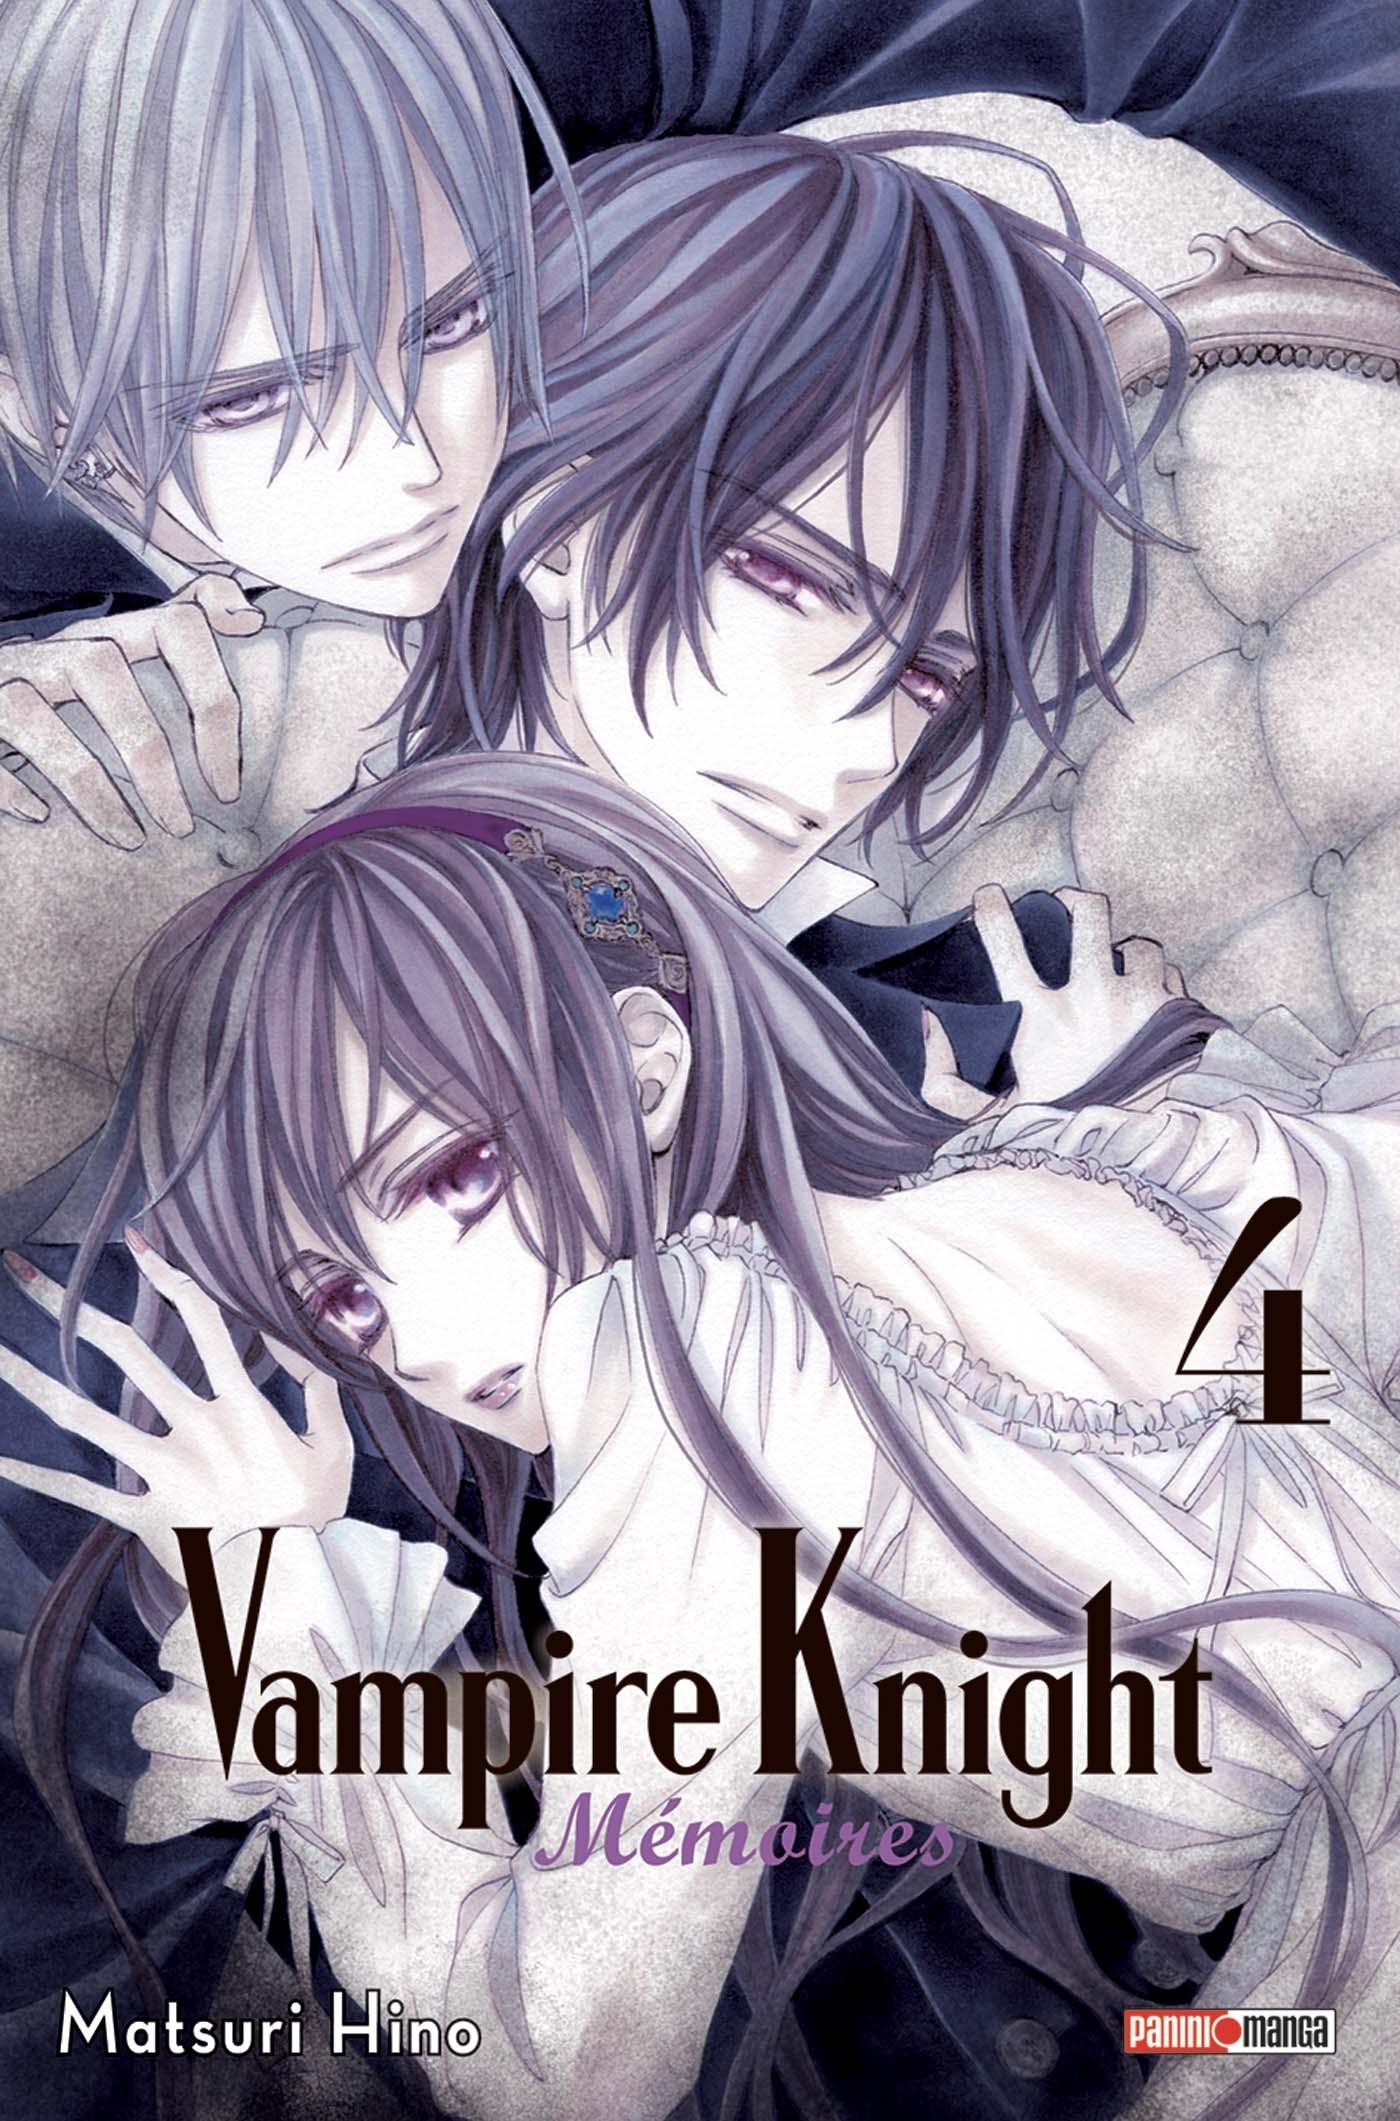 Vampire knight memories 4